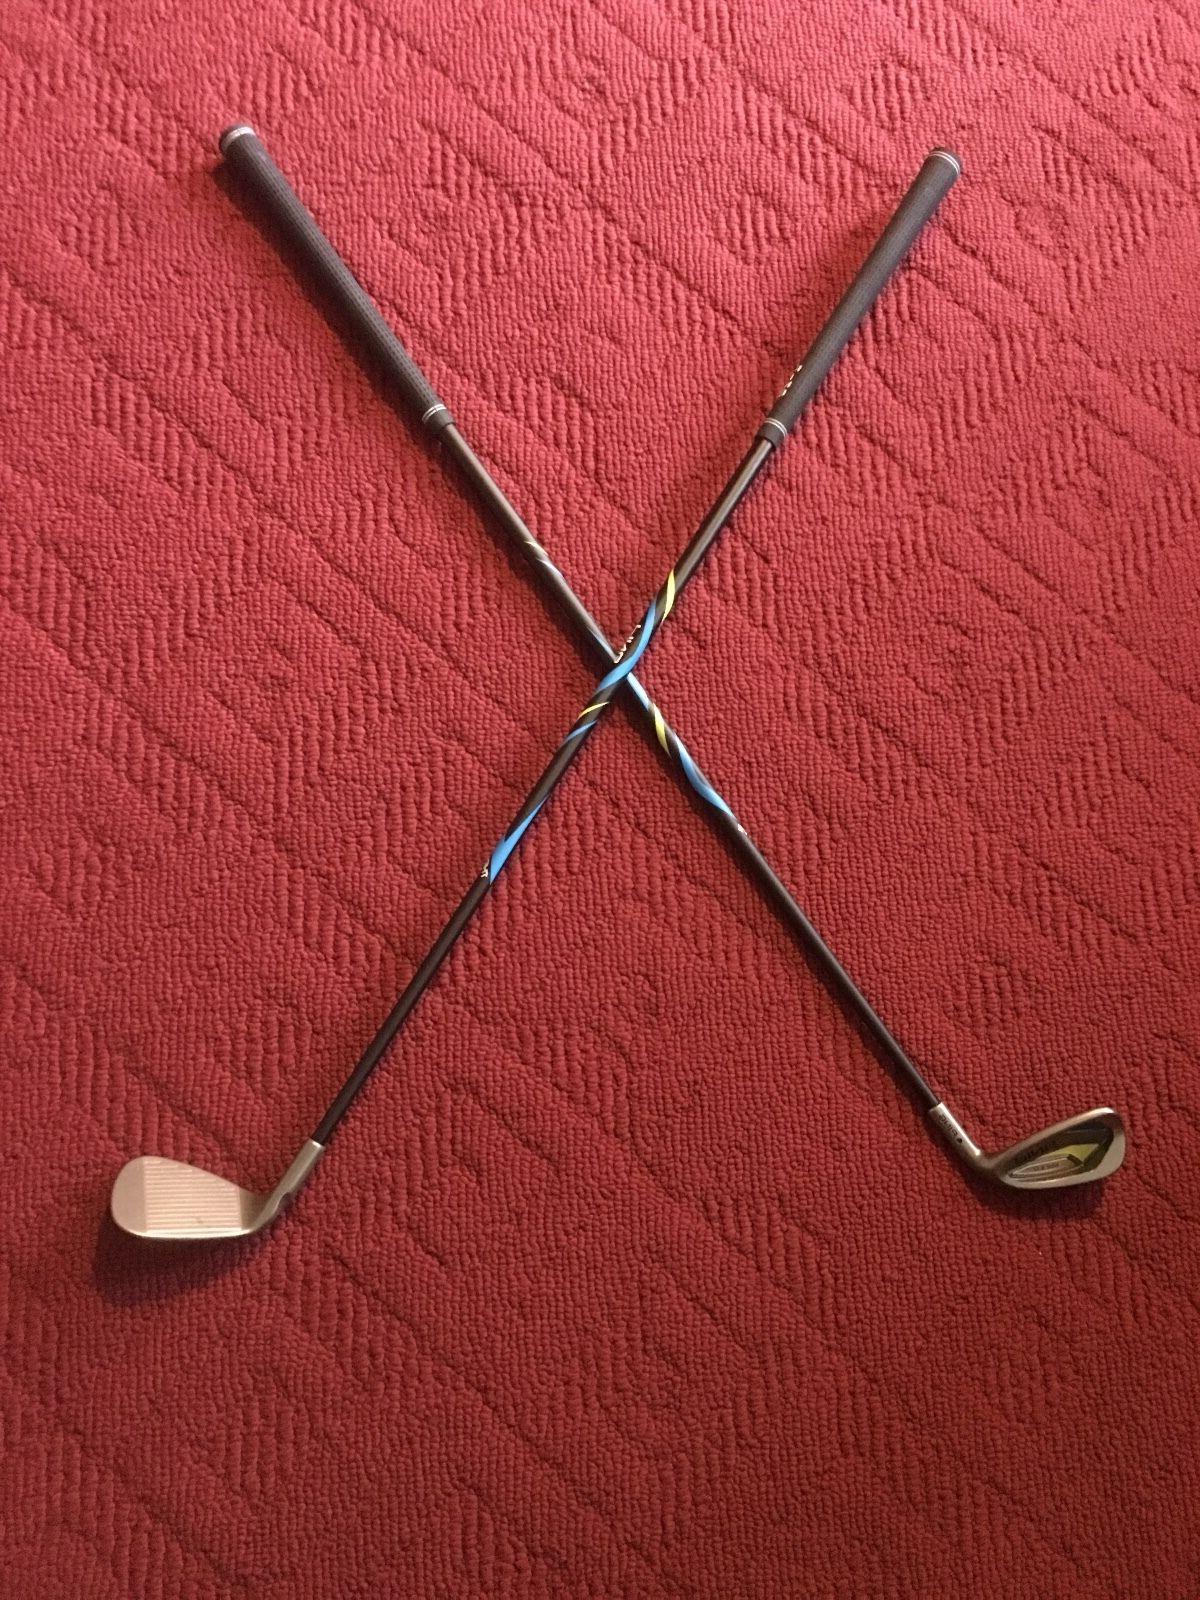 Ping Thrive Golf Club Set NEVER